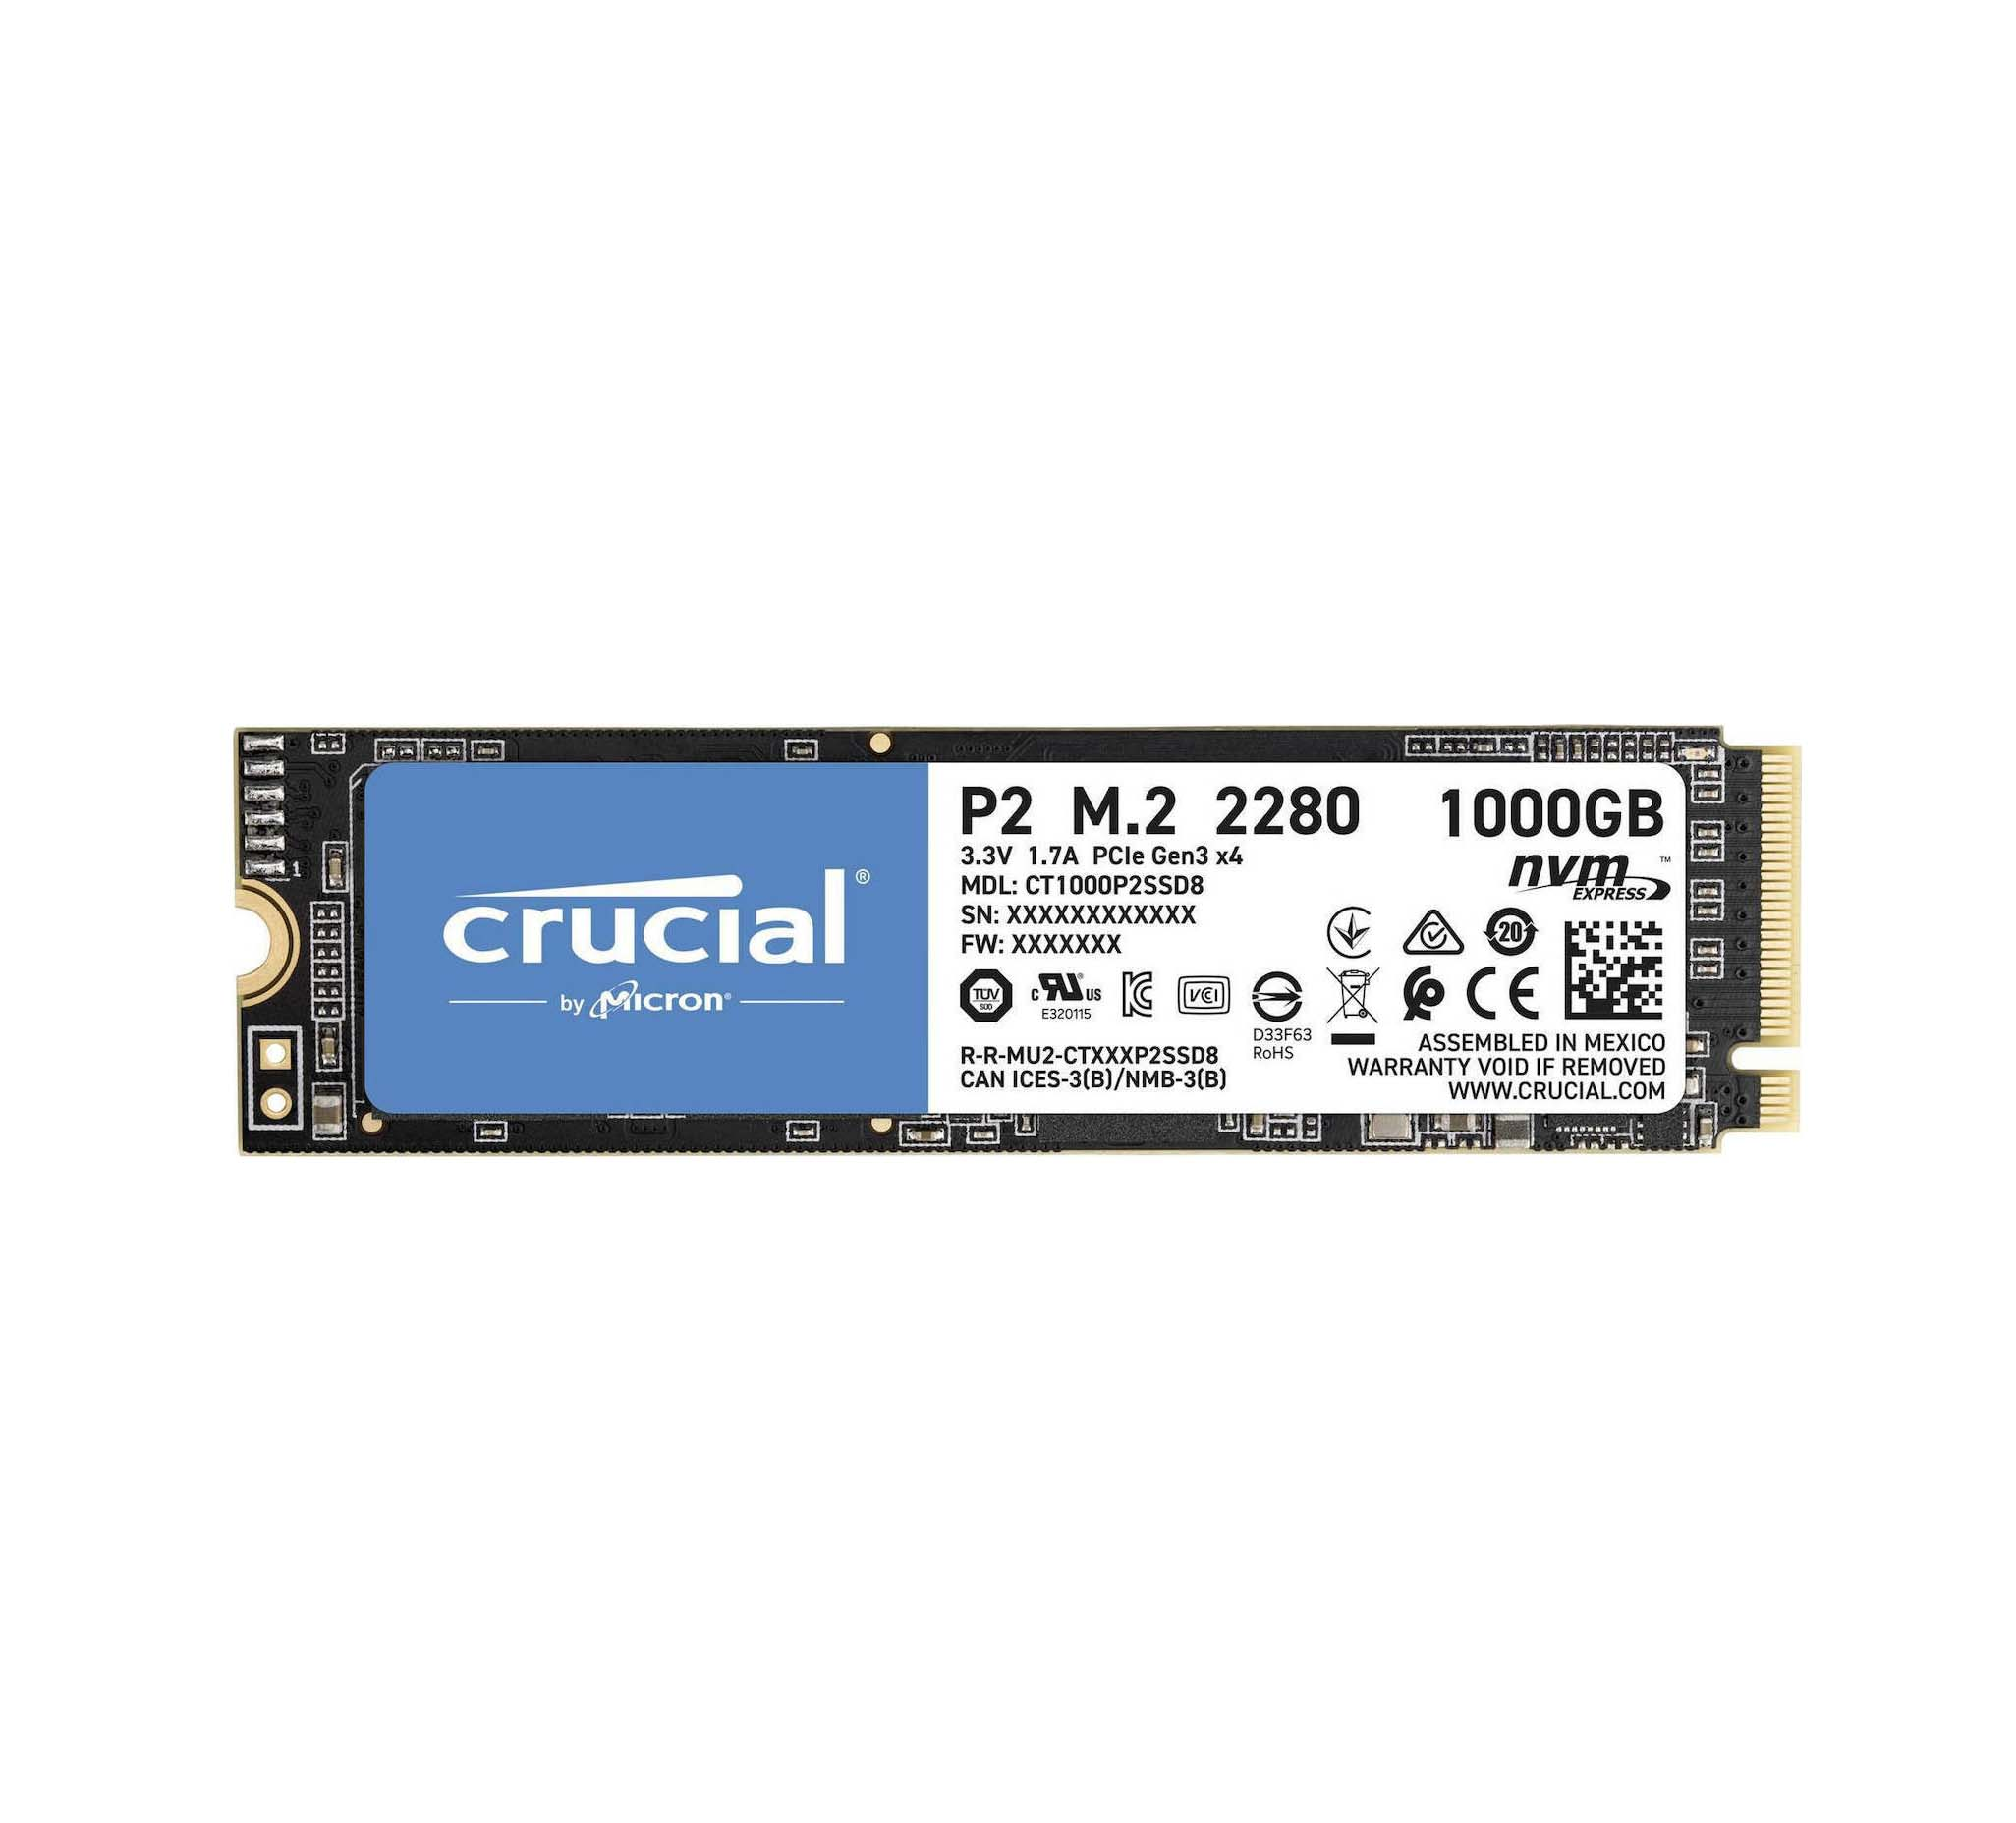 Crucial P2 SSD 1TB M.2 NVMe Σκληρός Δίσκος SSD CT1000P2SSD8